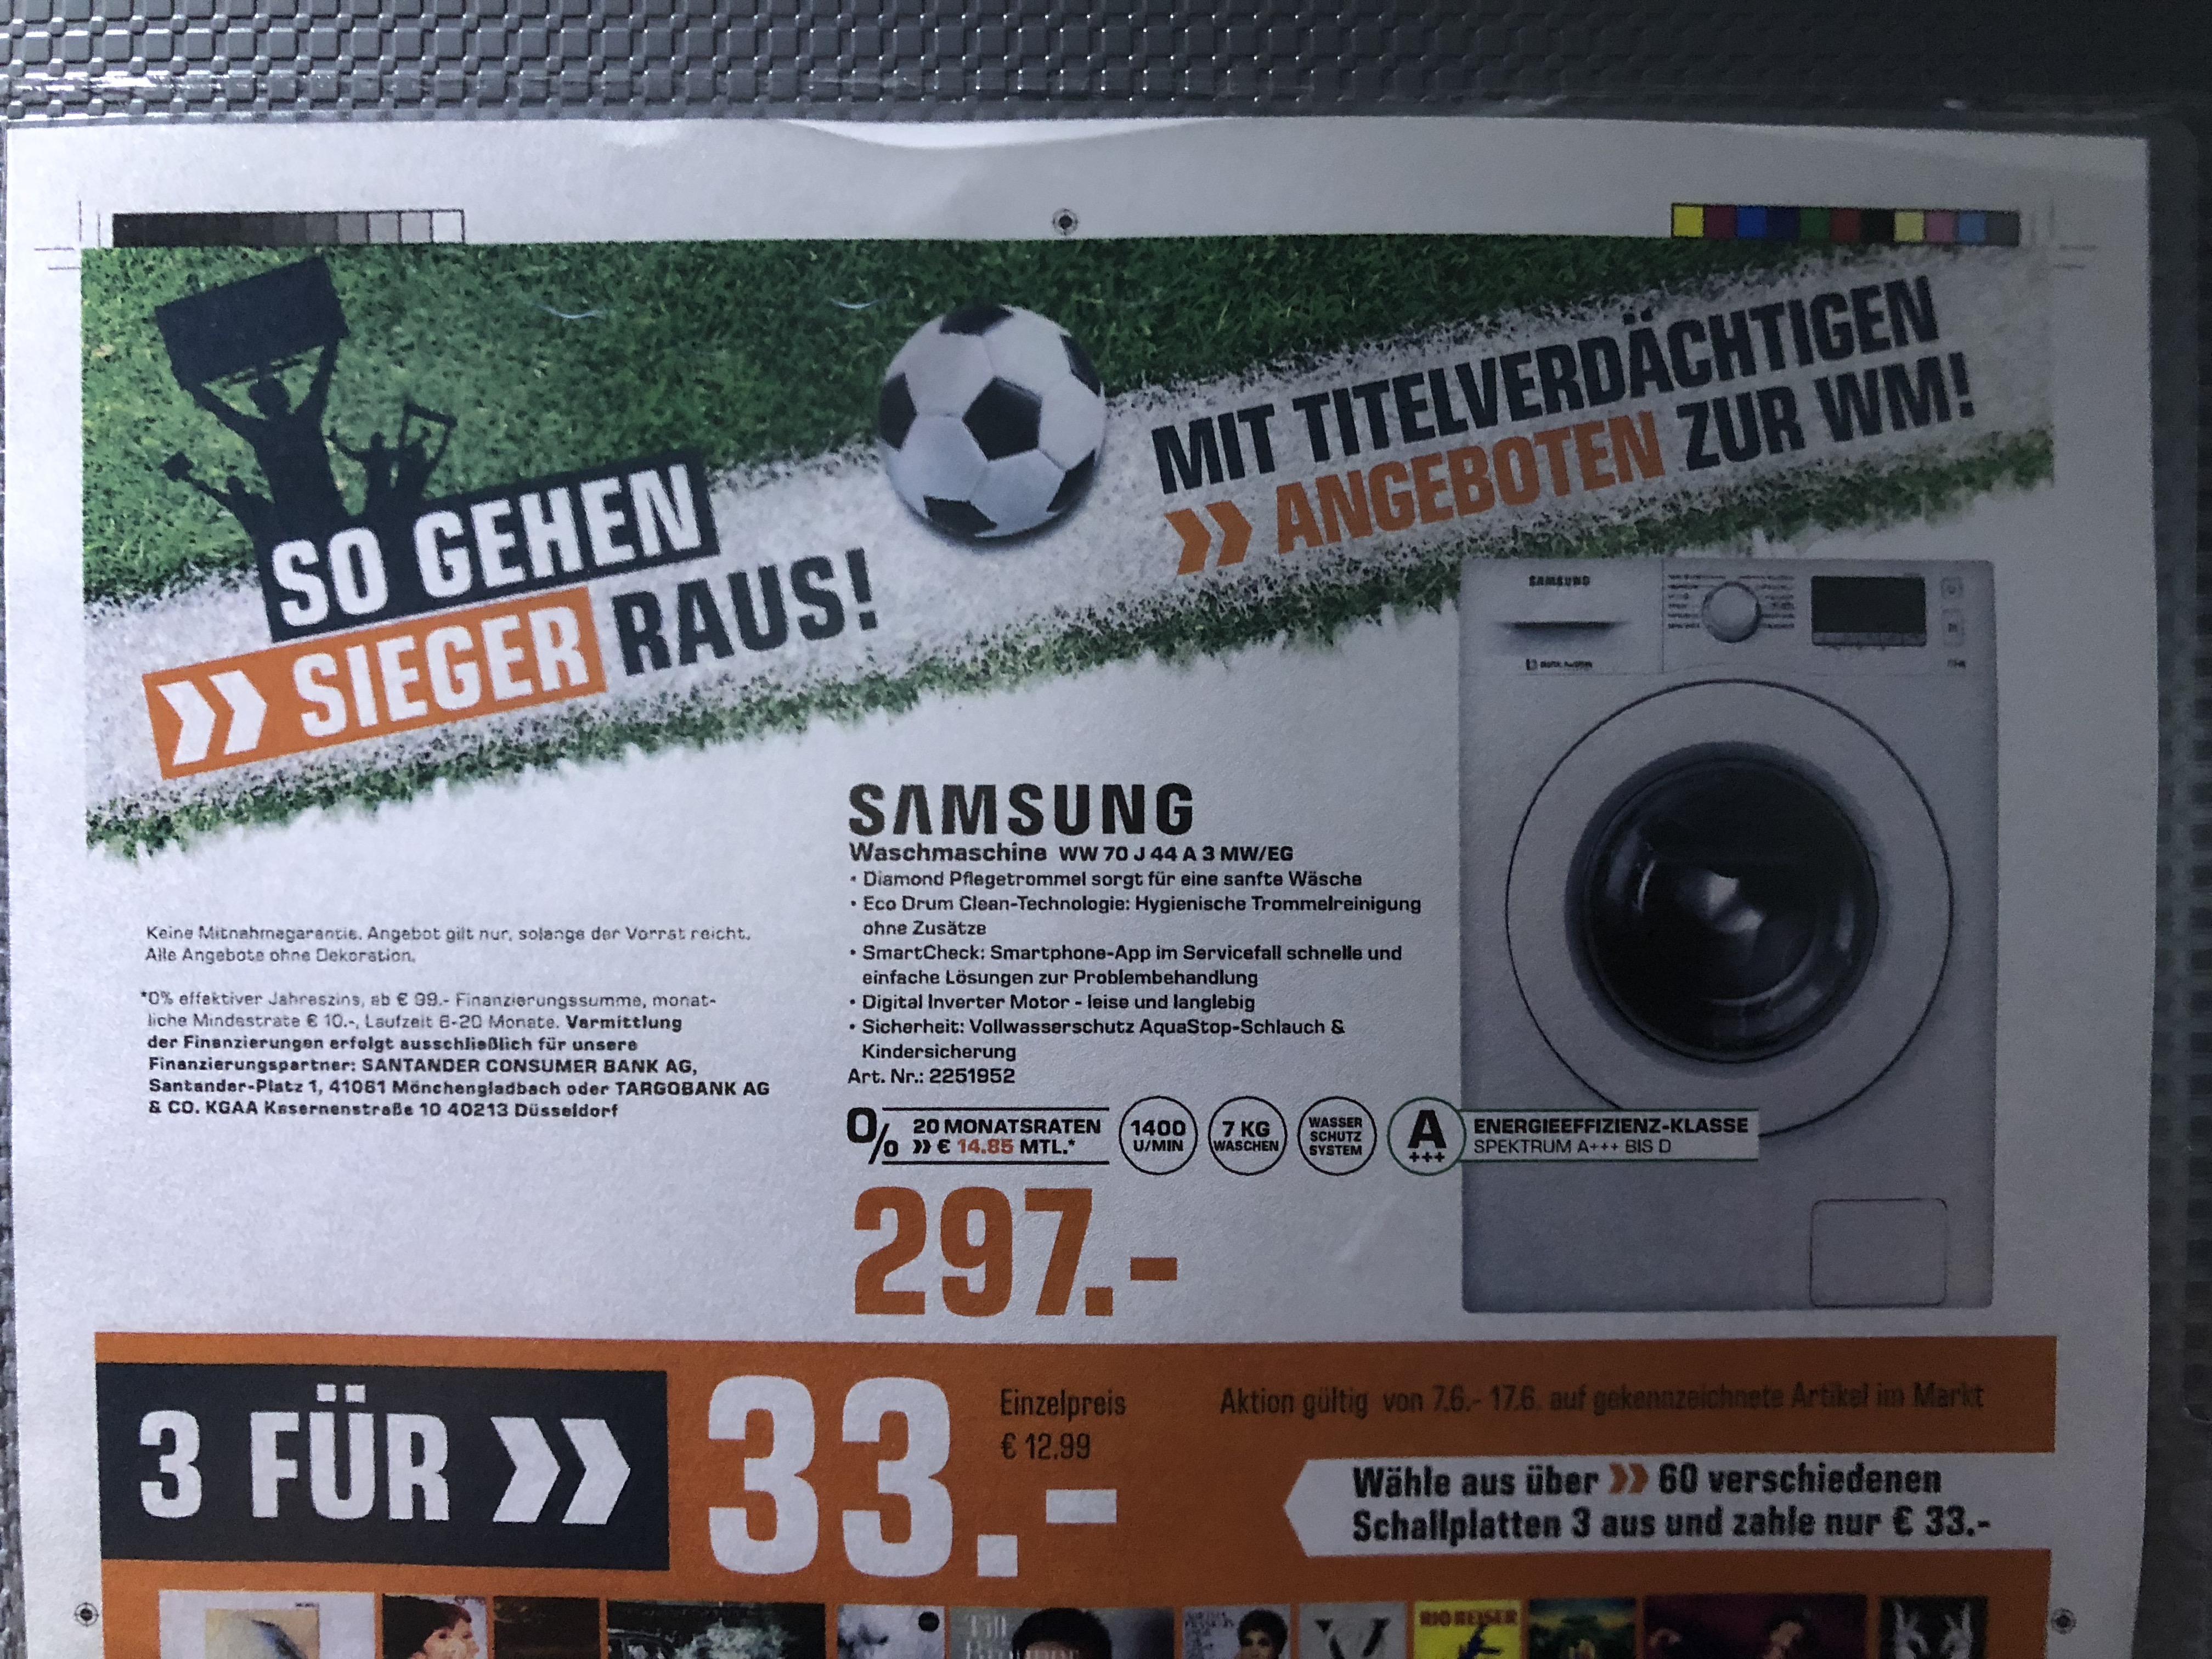 (Lokal Saturn Berlin + Potsdam) Samsung Waschmaschine WW70J44A3MW/EG A+++ 1400 U/Min 7KG für 297€